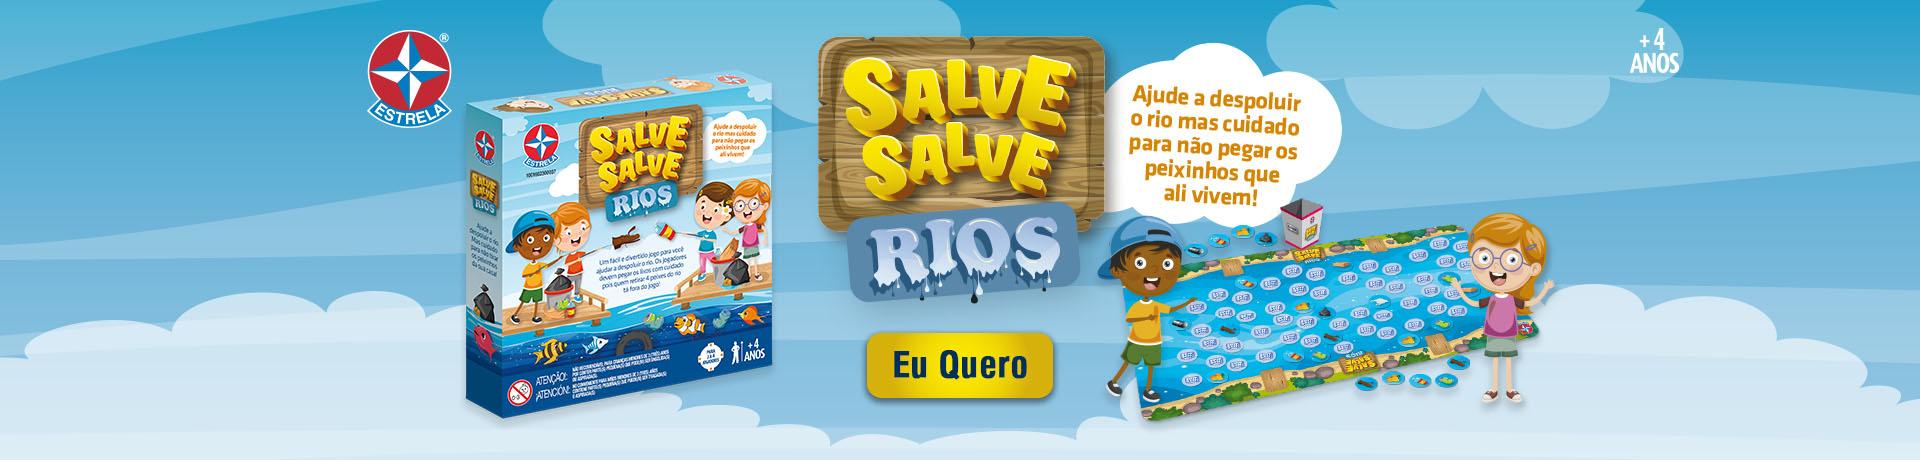 Jogo Salve Salve Rios